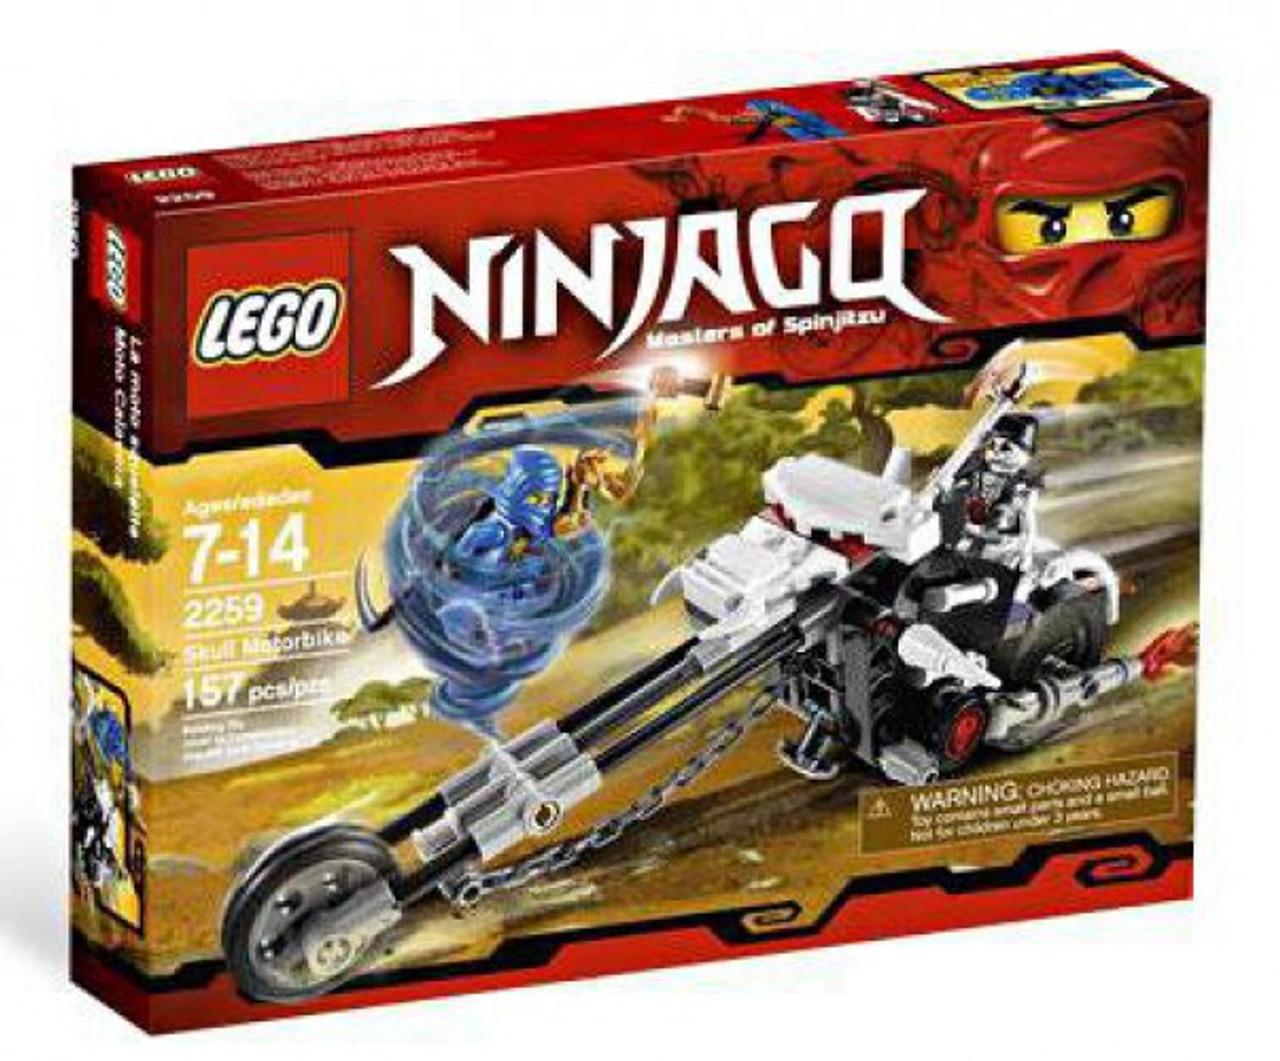 LEGO Ninjago Skull Motorbike Set #2259